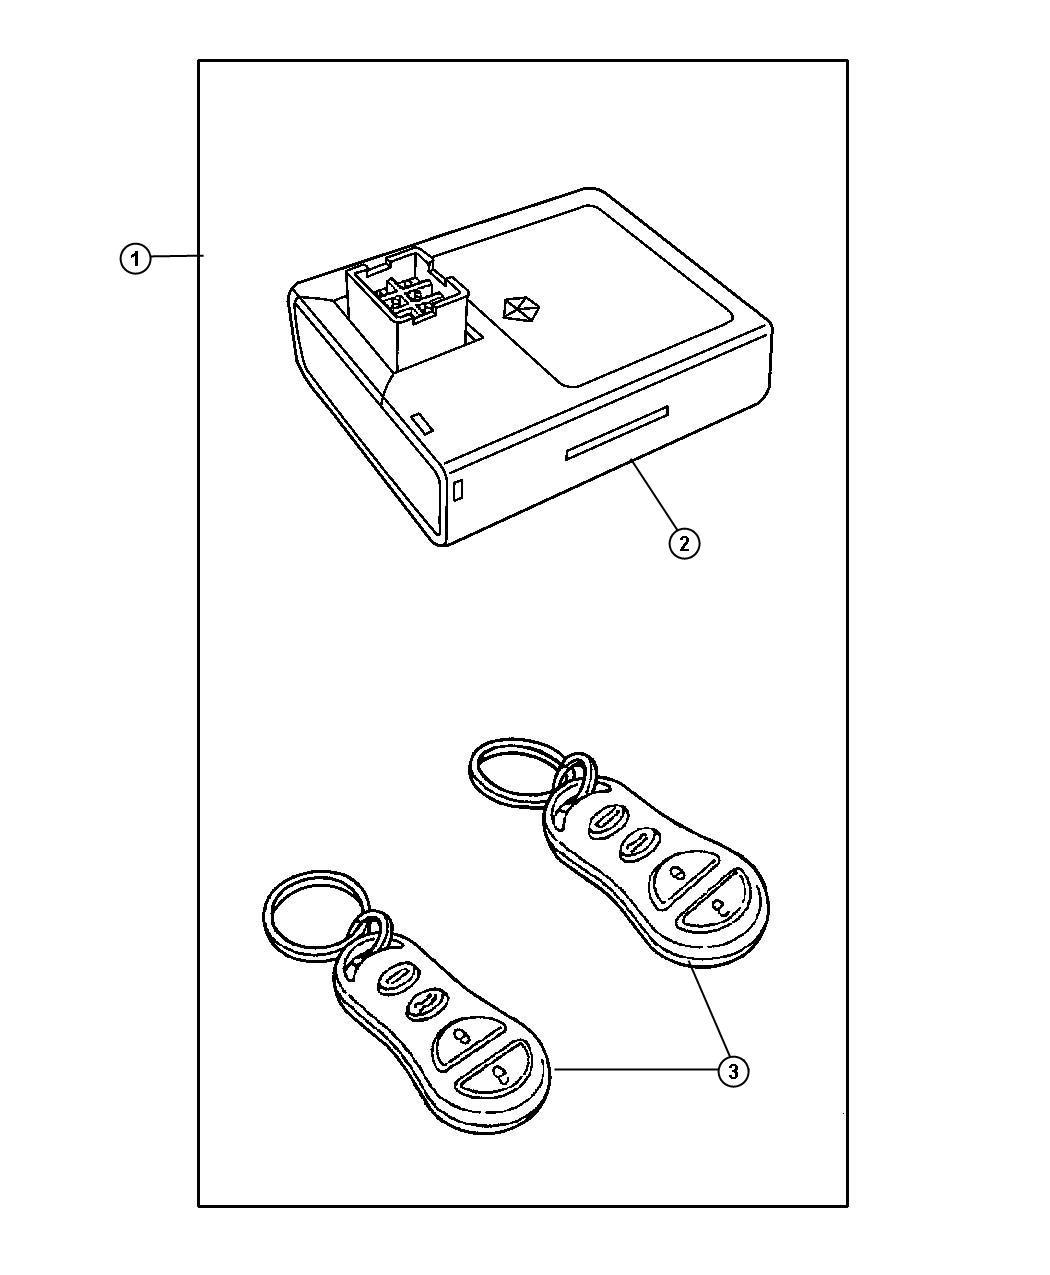 [DIAGRAM] 2003 Dodge Ram Remote Keyless Entry Wiring